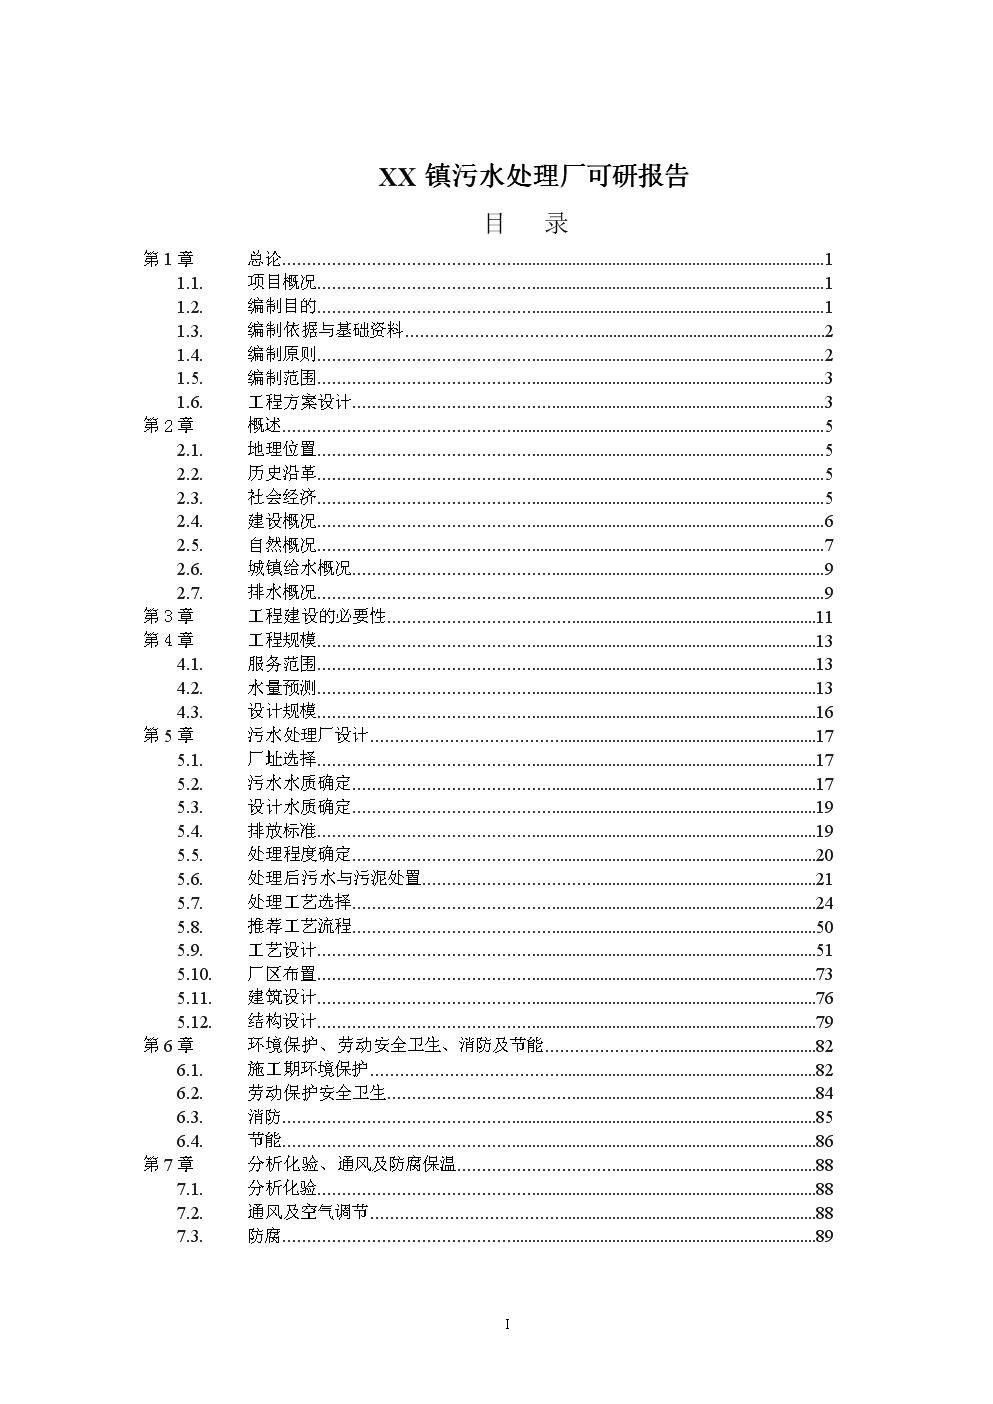 XX镇污水处理厂可研报告.doc